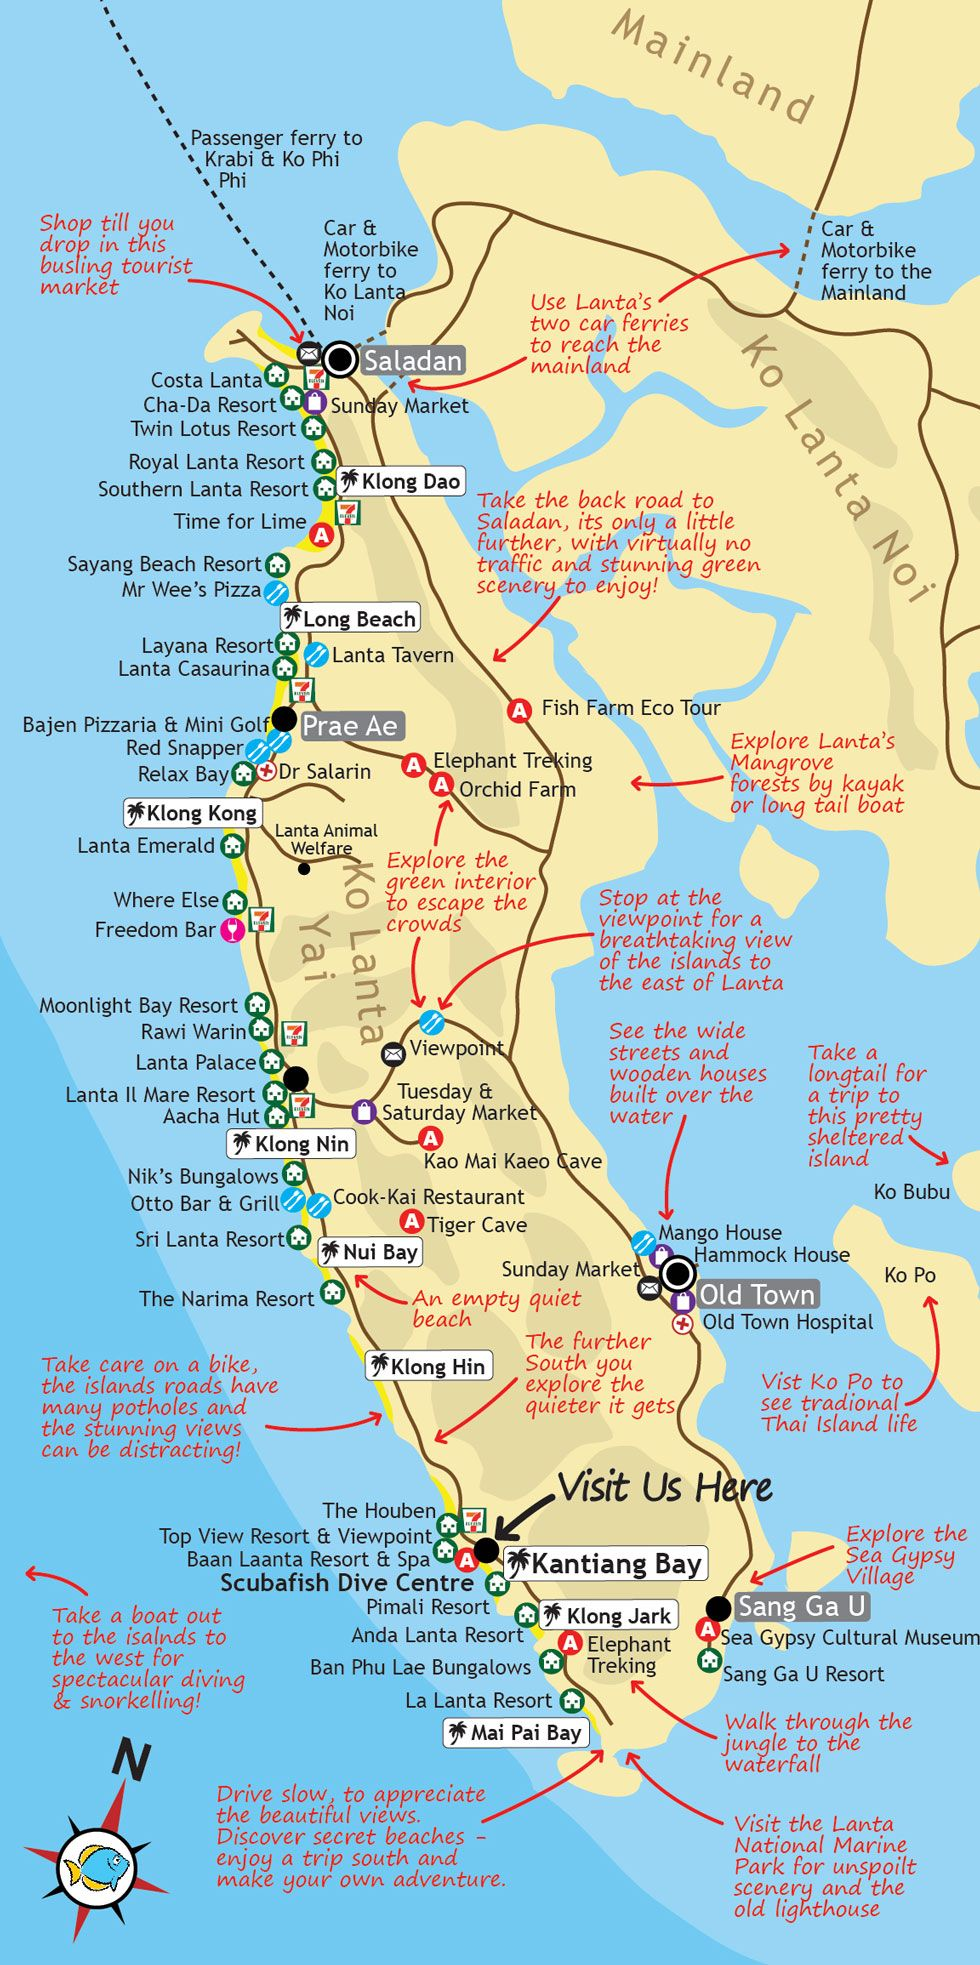 Ko Lanta Map this map of Ko Lanta in Southern Thailand